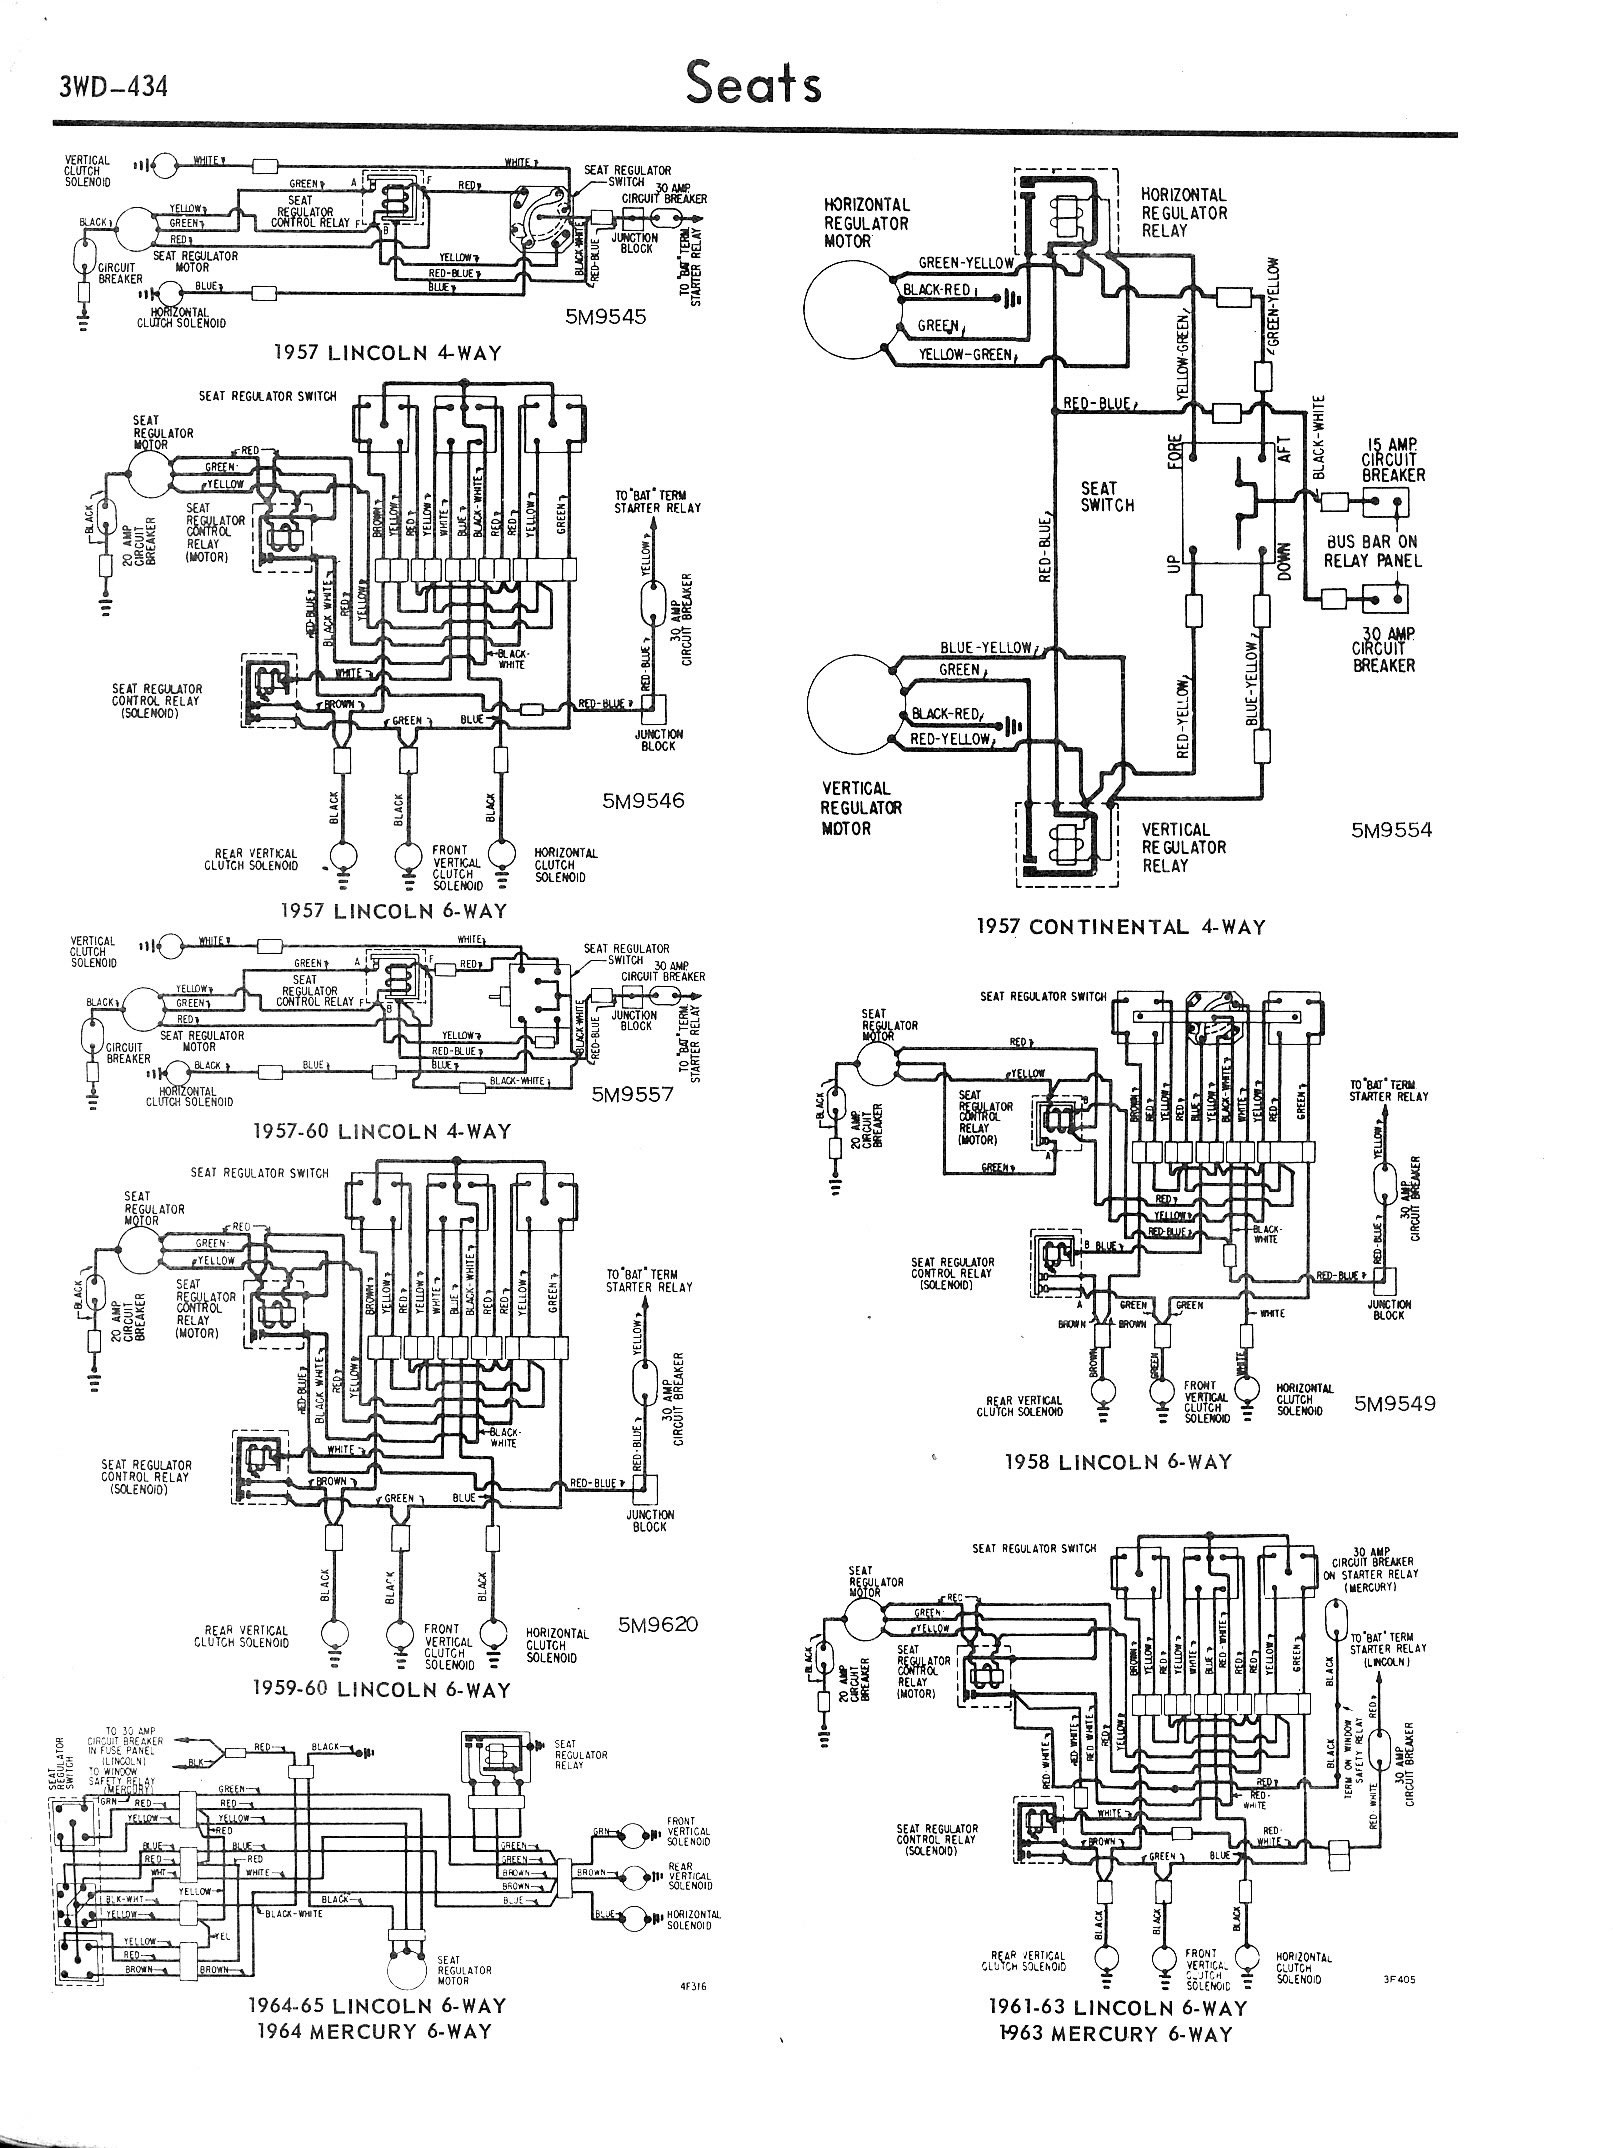 1966 Ford Alternator Wiring Ford Diagrams